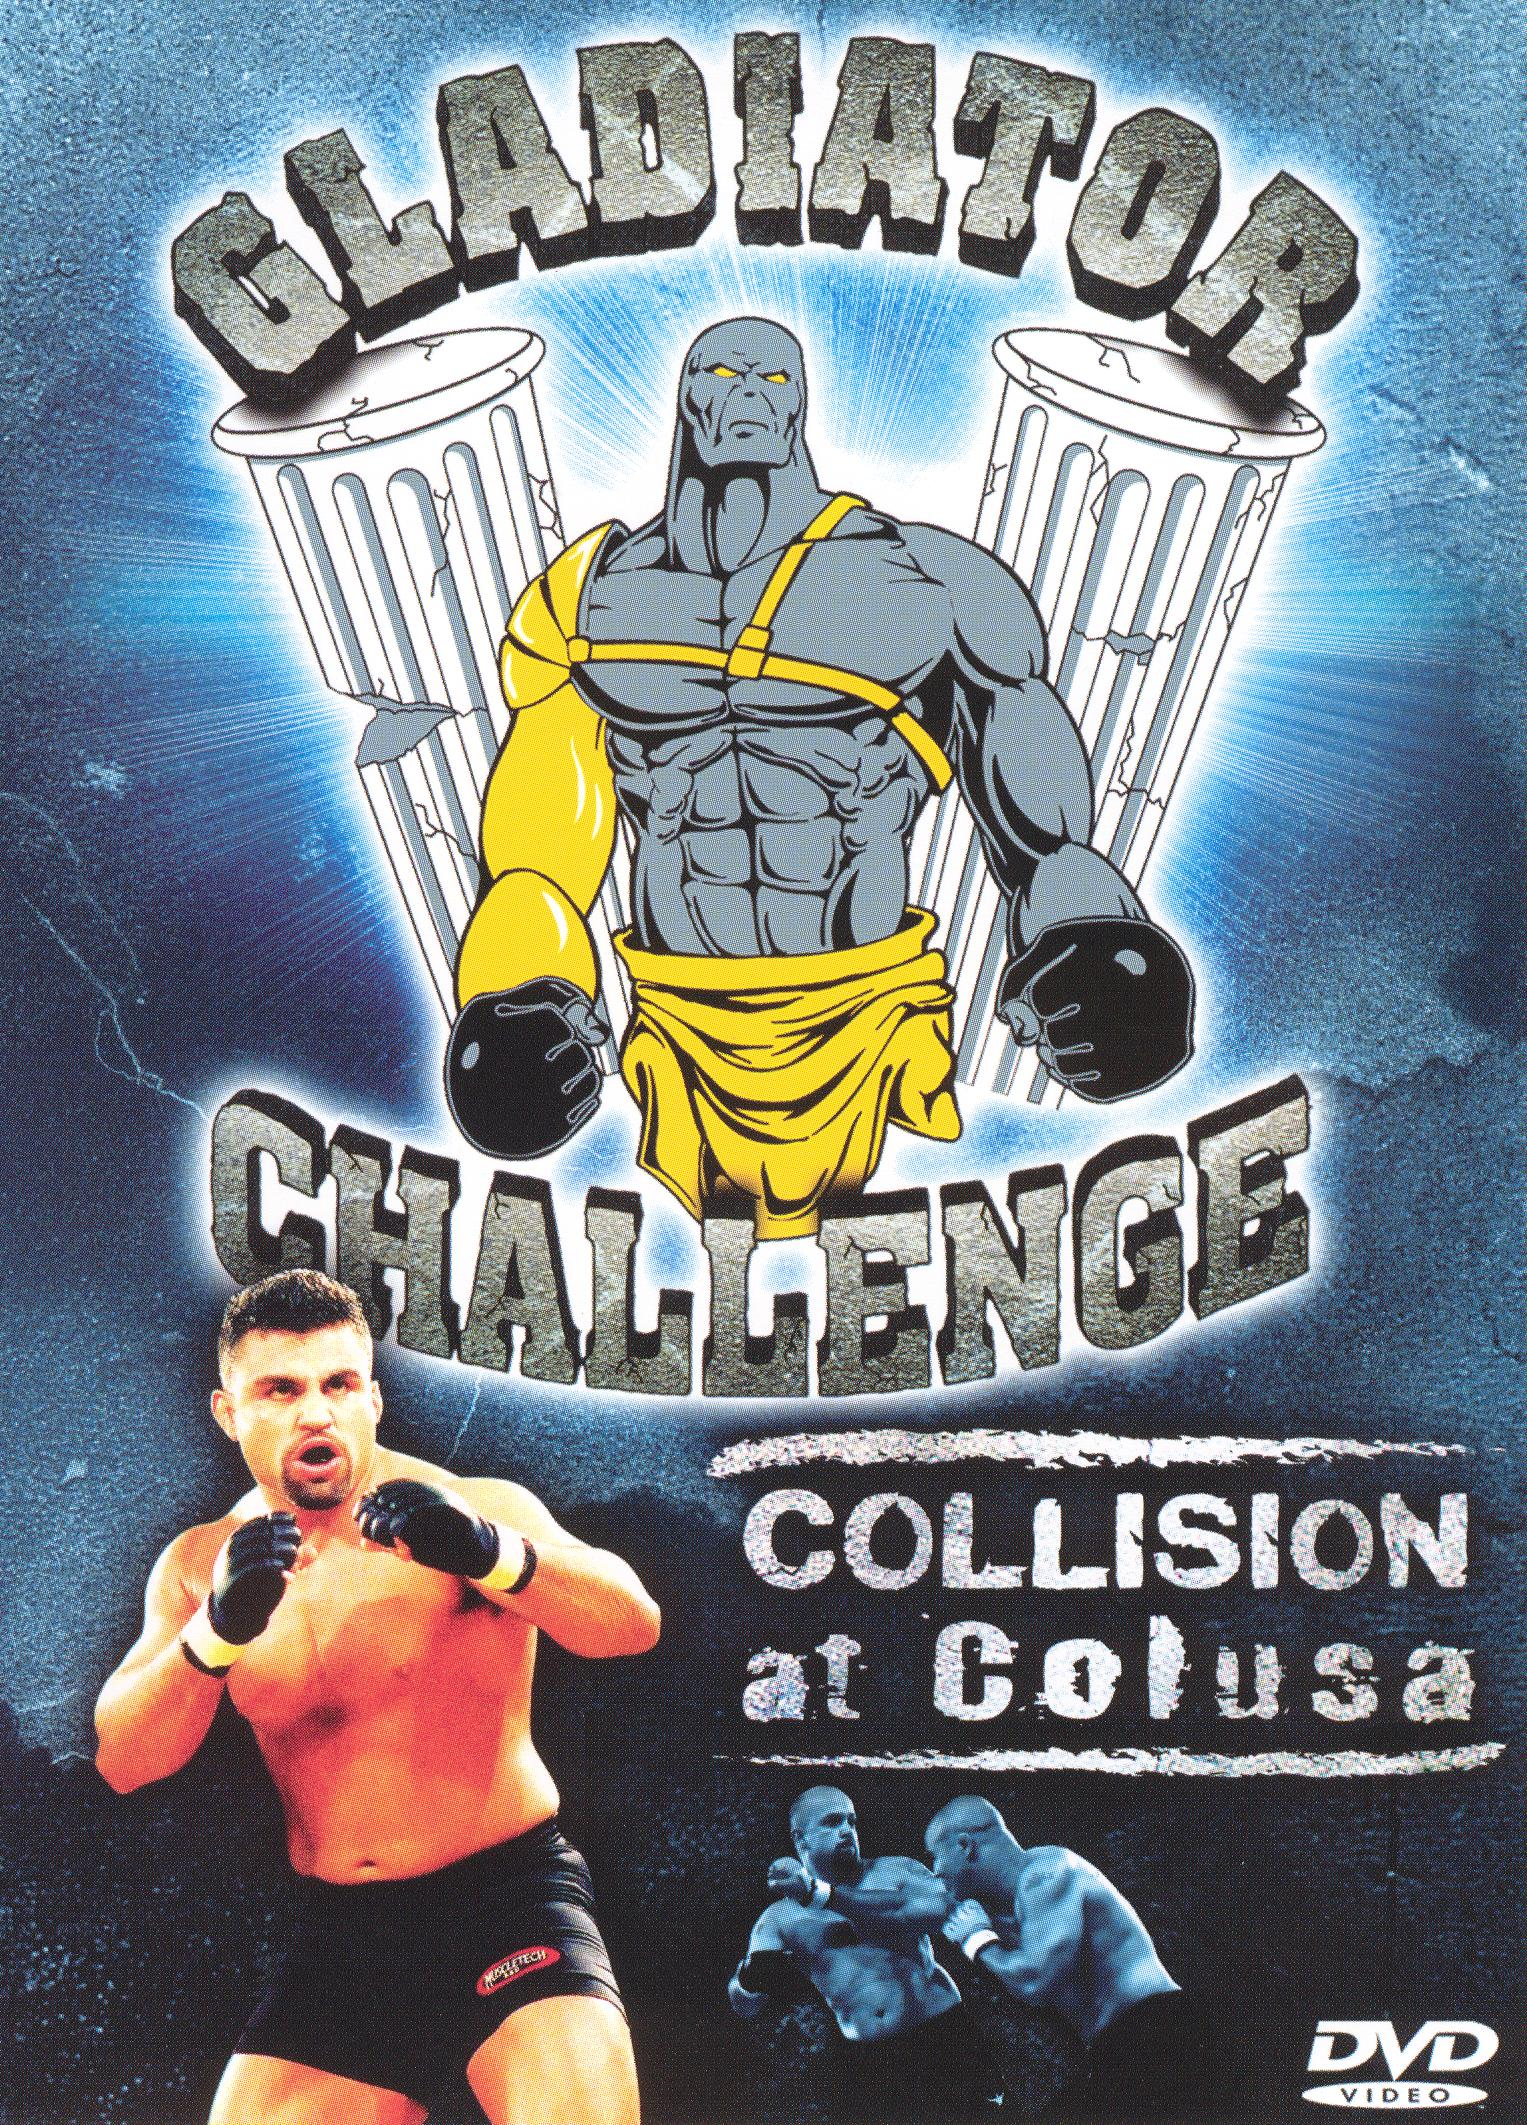 Gladiator Challenge: Collision at Colusa